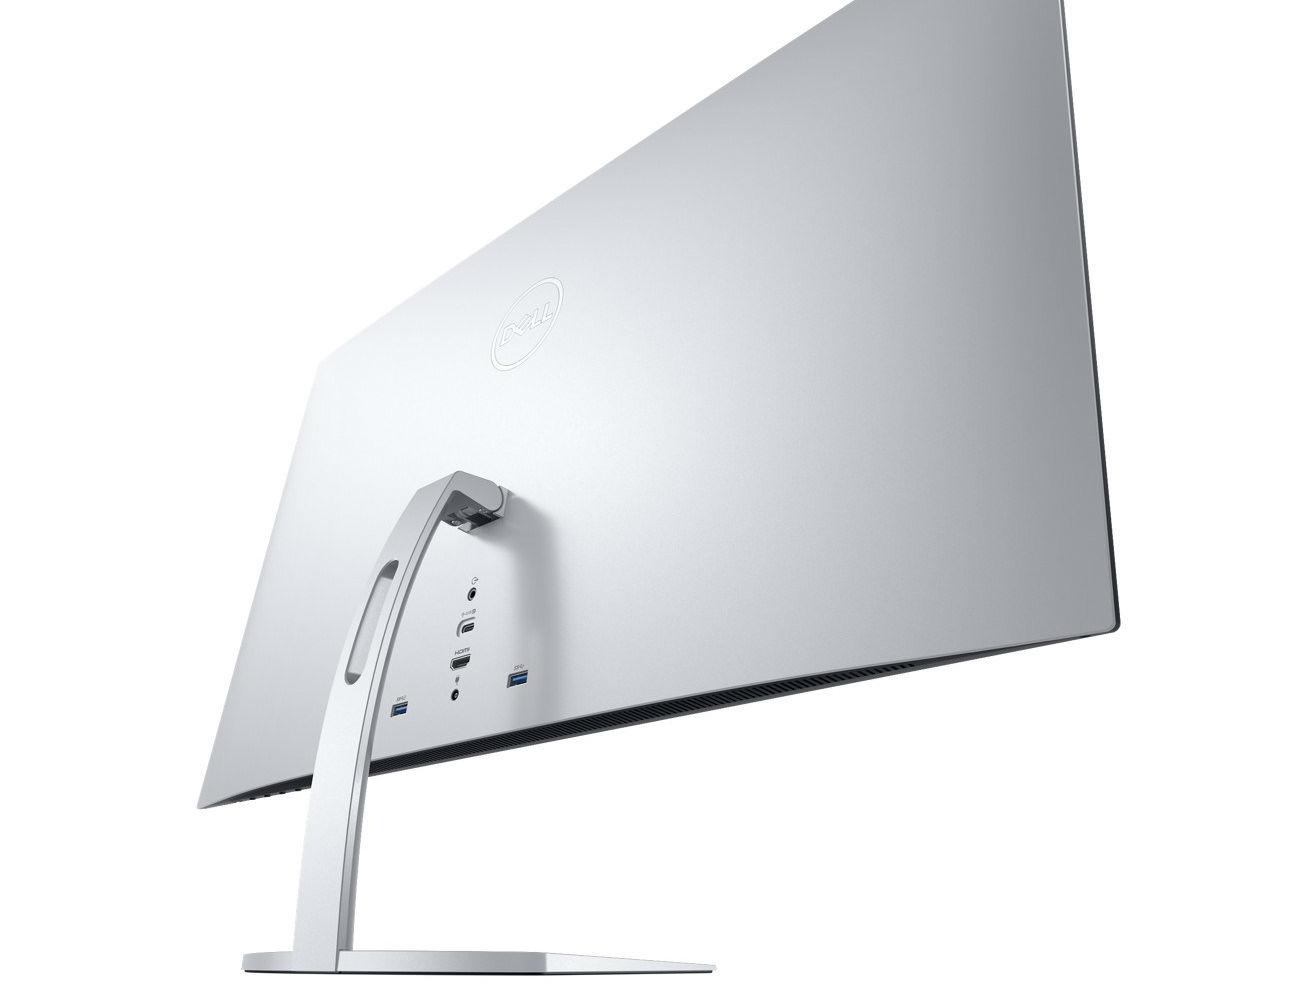 Dell 27 USB-C Ultrathin Monitor